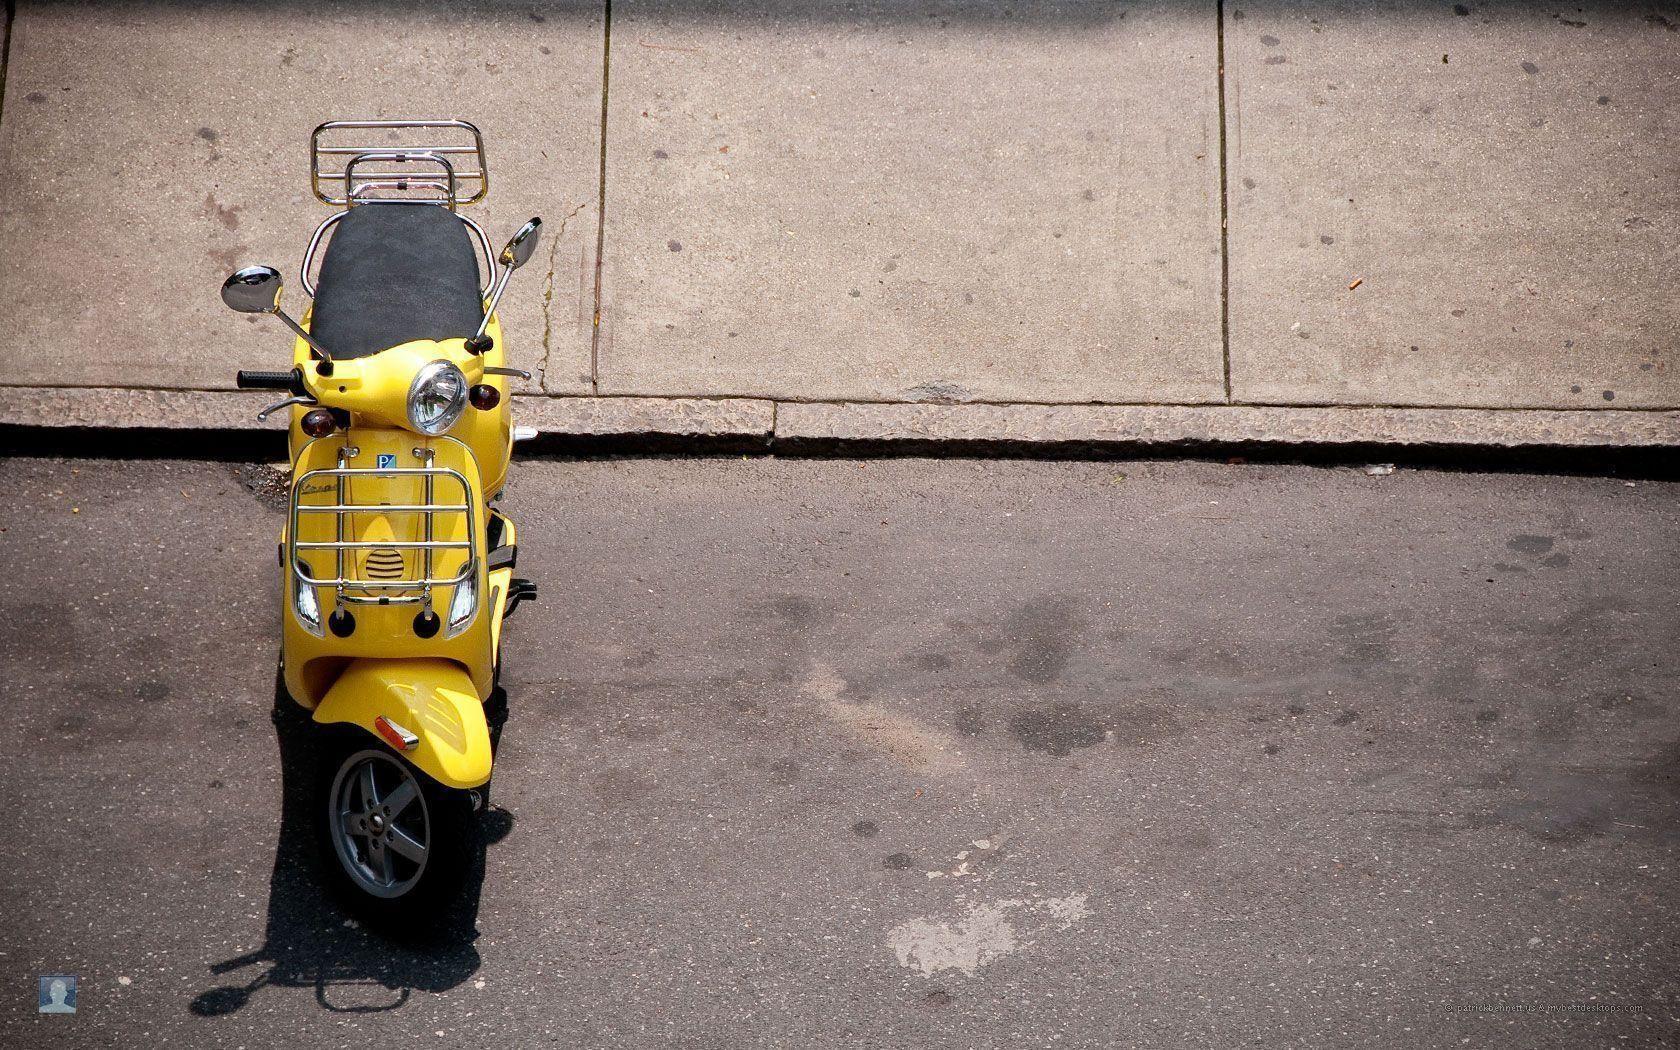 Pin By Khalilahmadkhan On Vespa Bike Full Hd Wallpapers Free